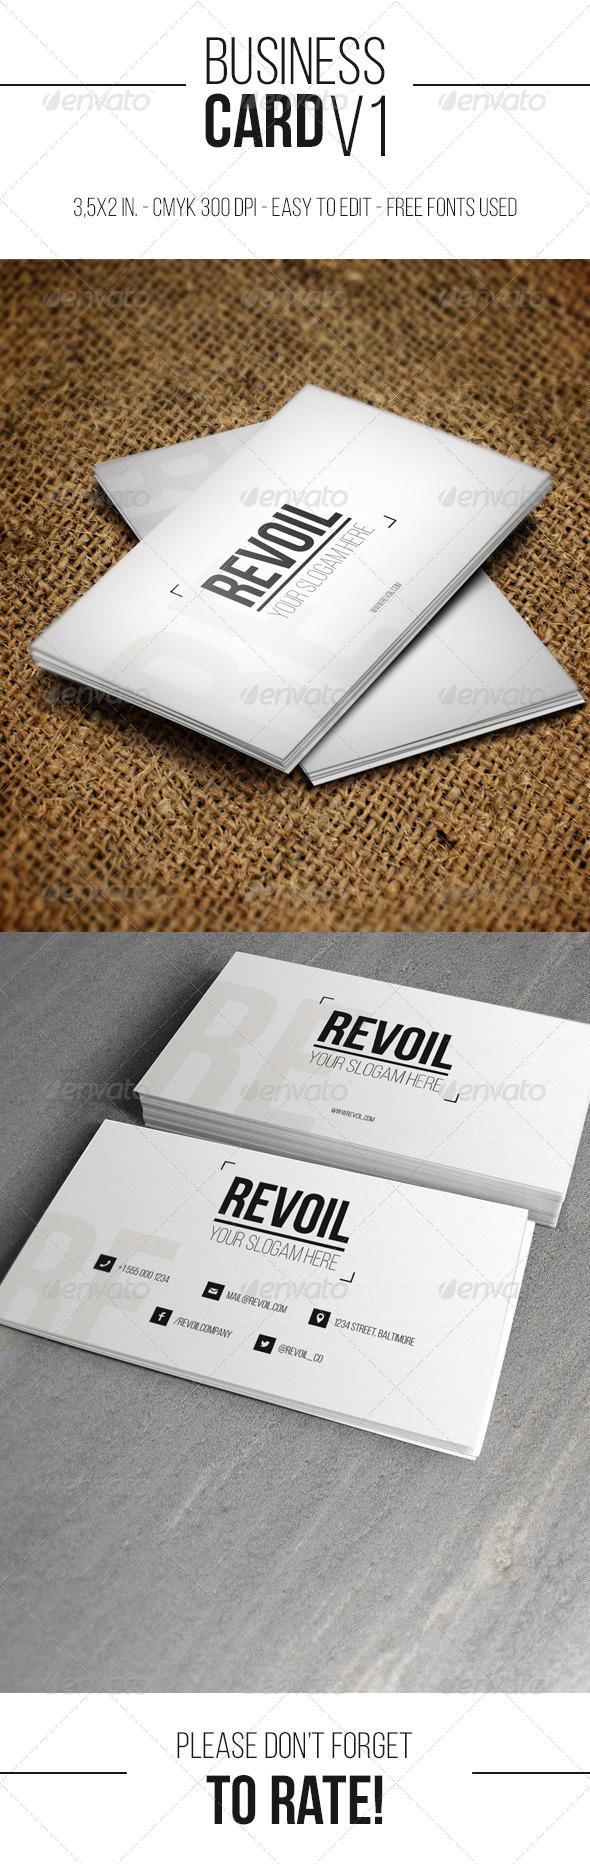 Business Card V1 - Creative Business Cards